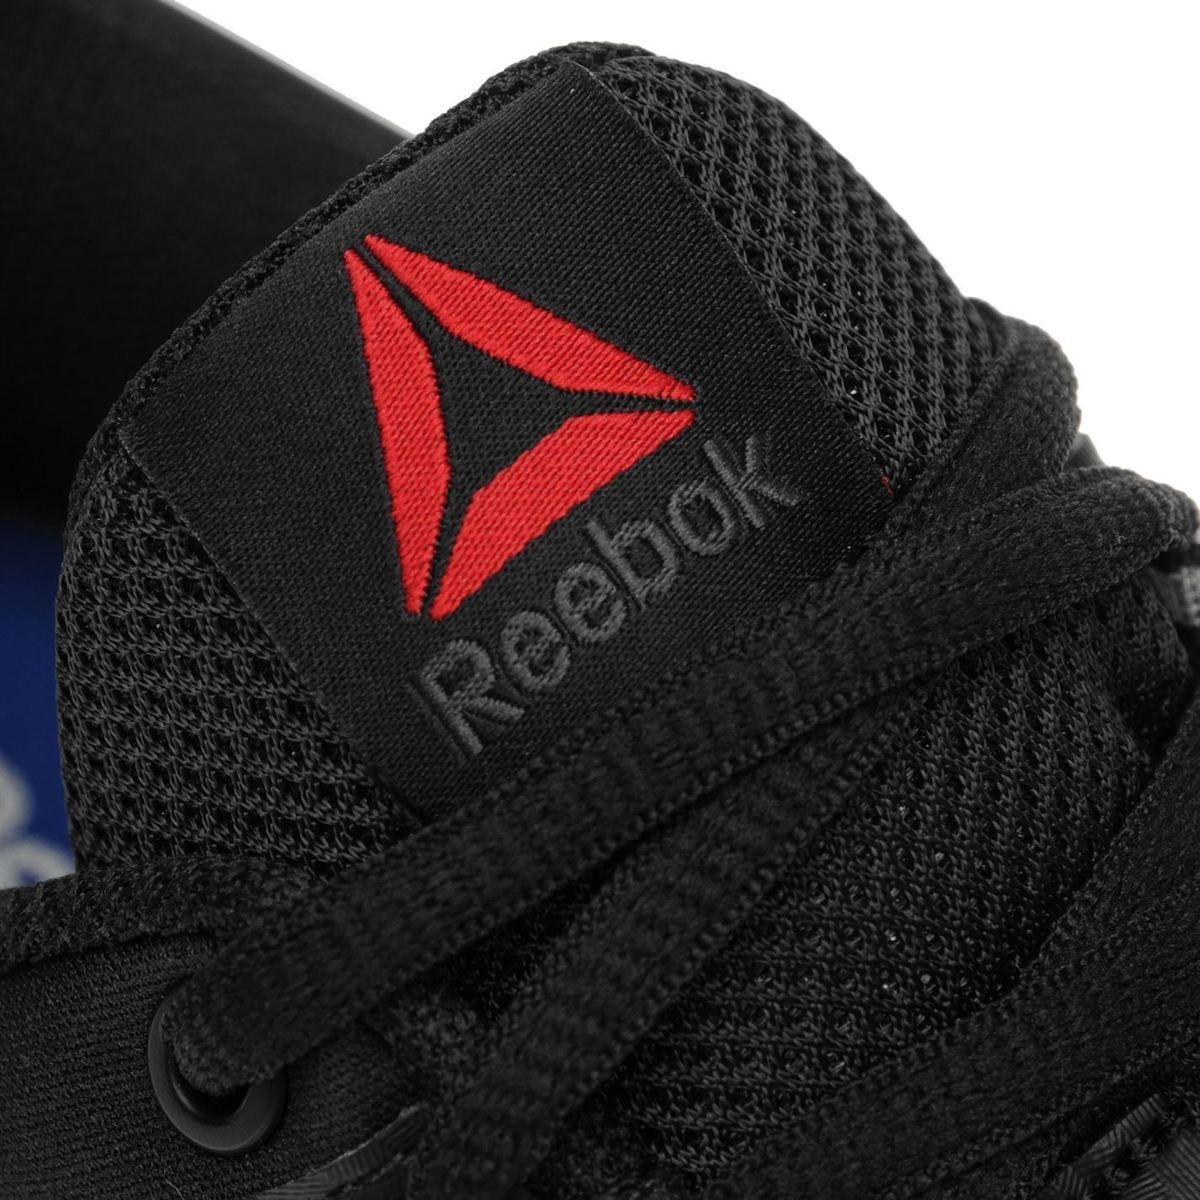 Reebok Yourflex 8 Trainers Men's